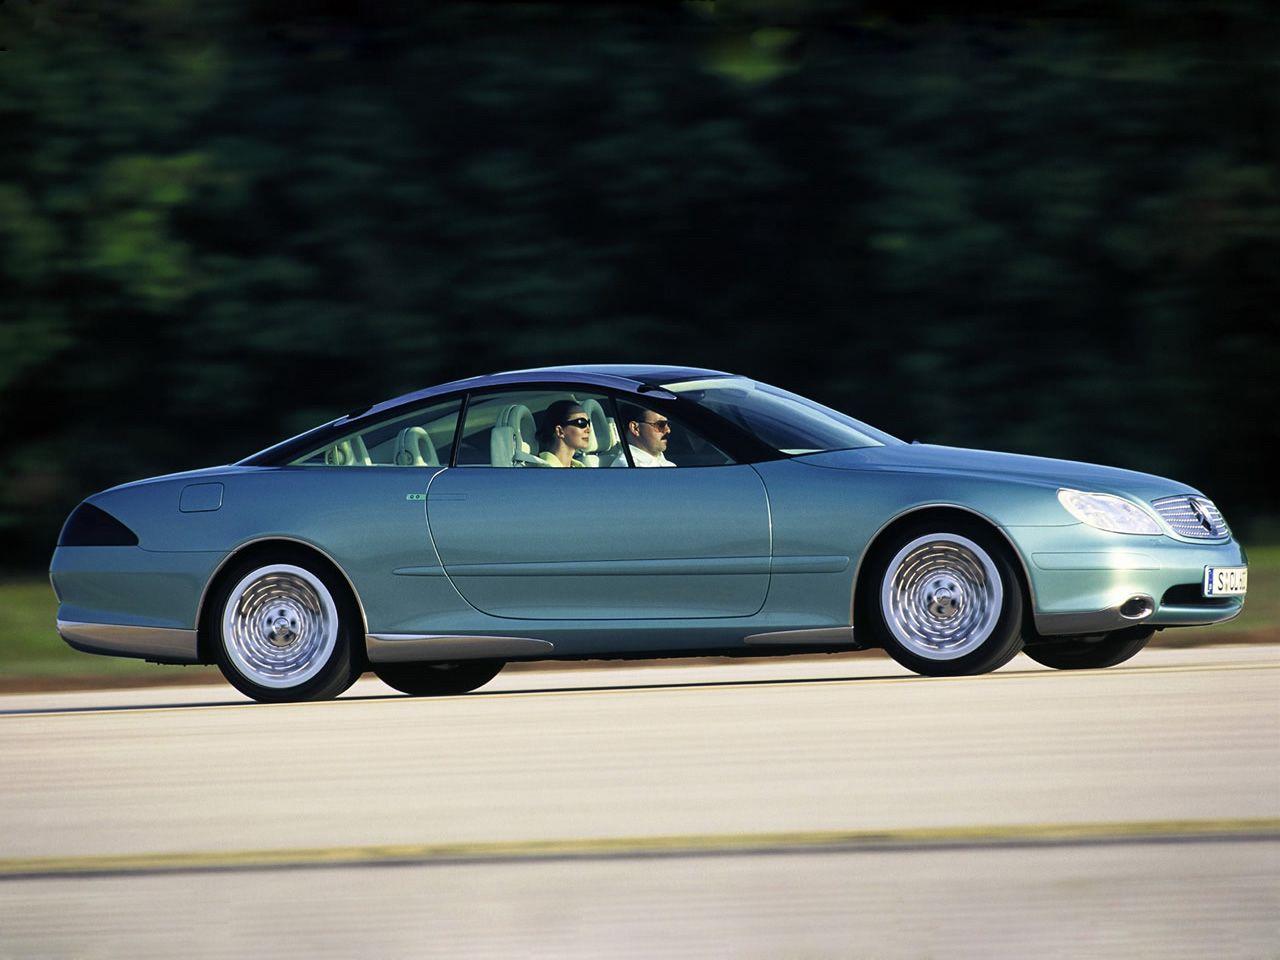 Mercedes-F200-Imagination-Concept-01.jpg